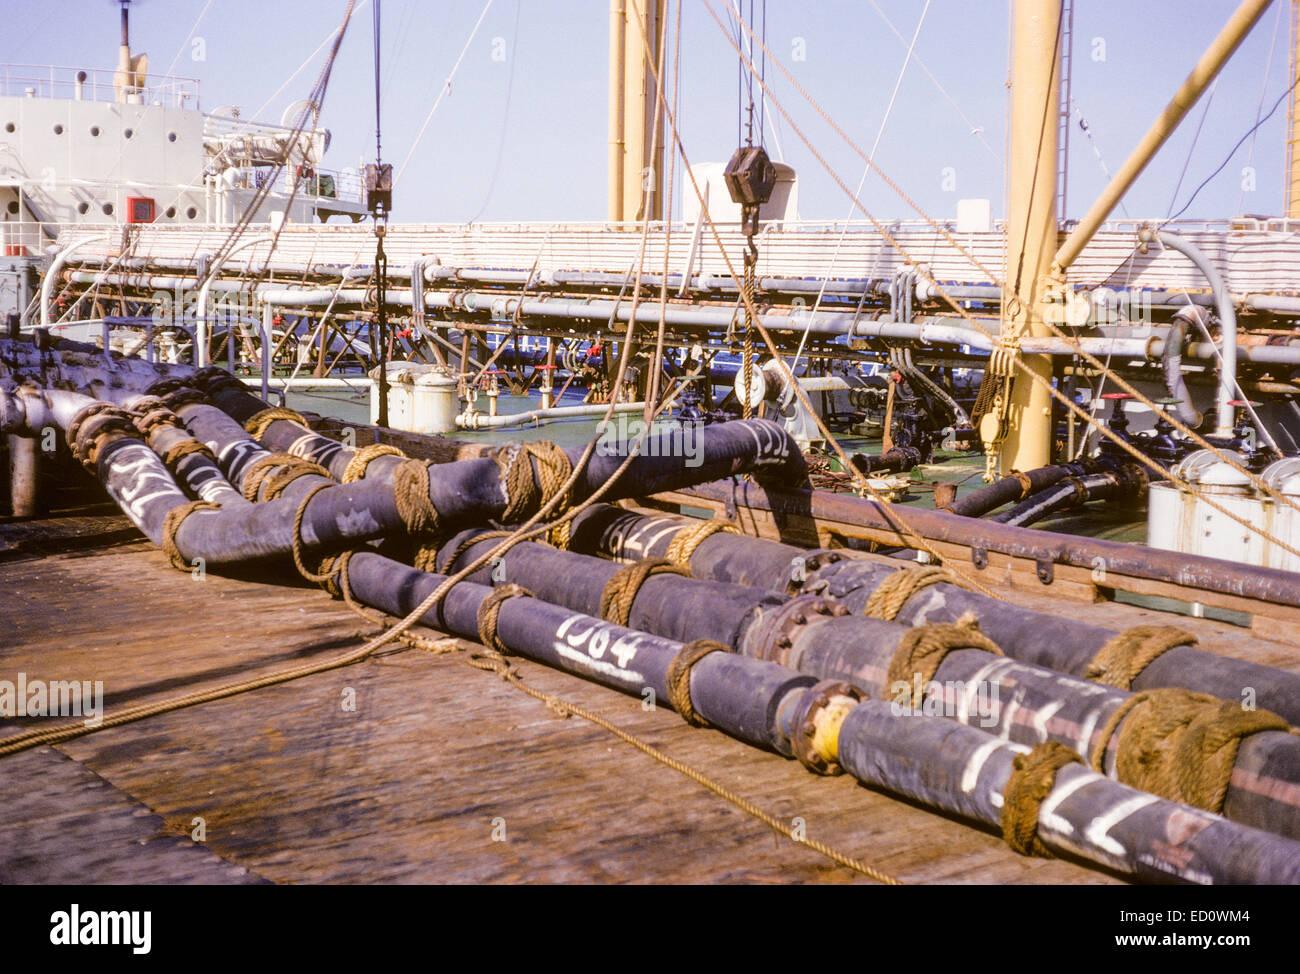 Kuwait November 1966  Loading Oil Tanker, Kuwait Oil Company Wharf